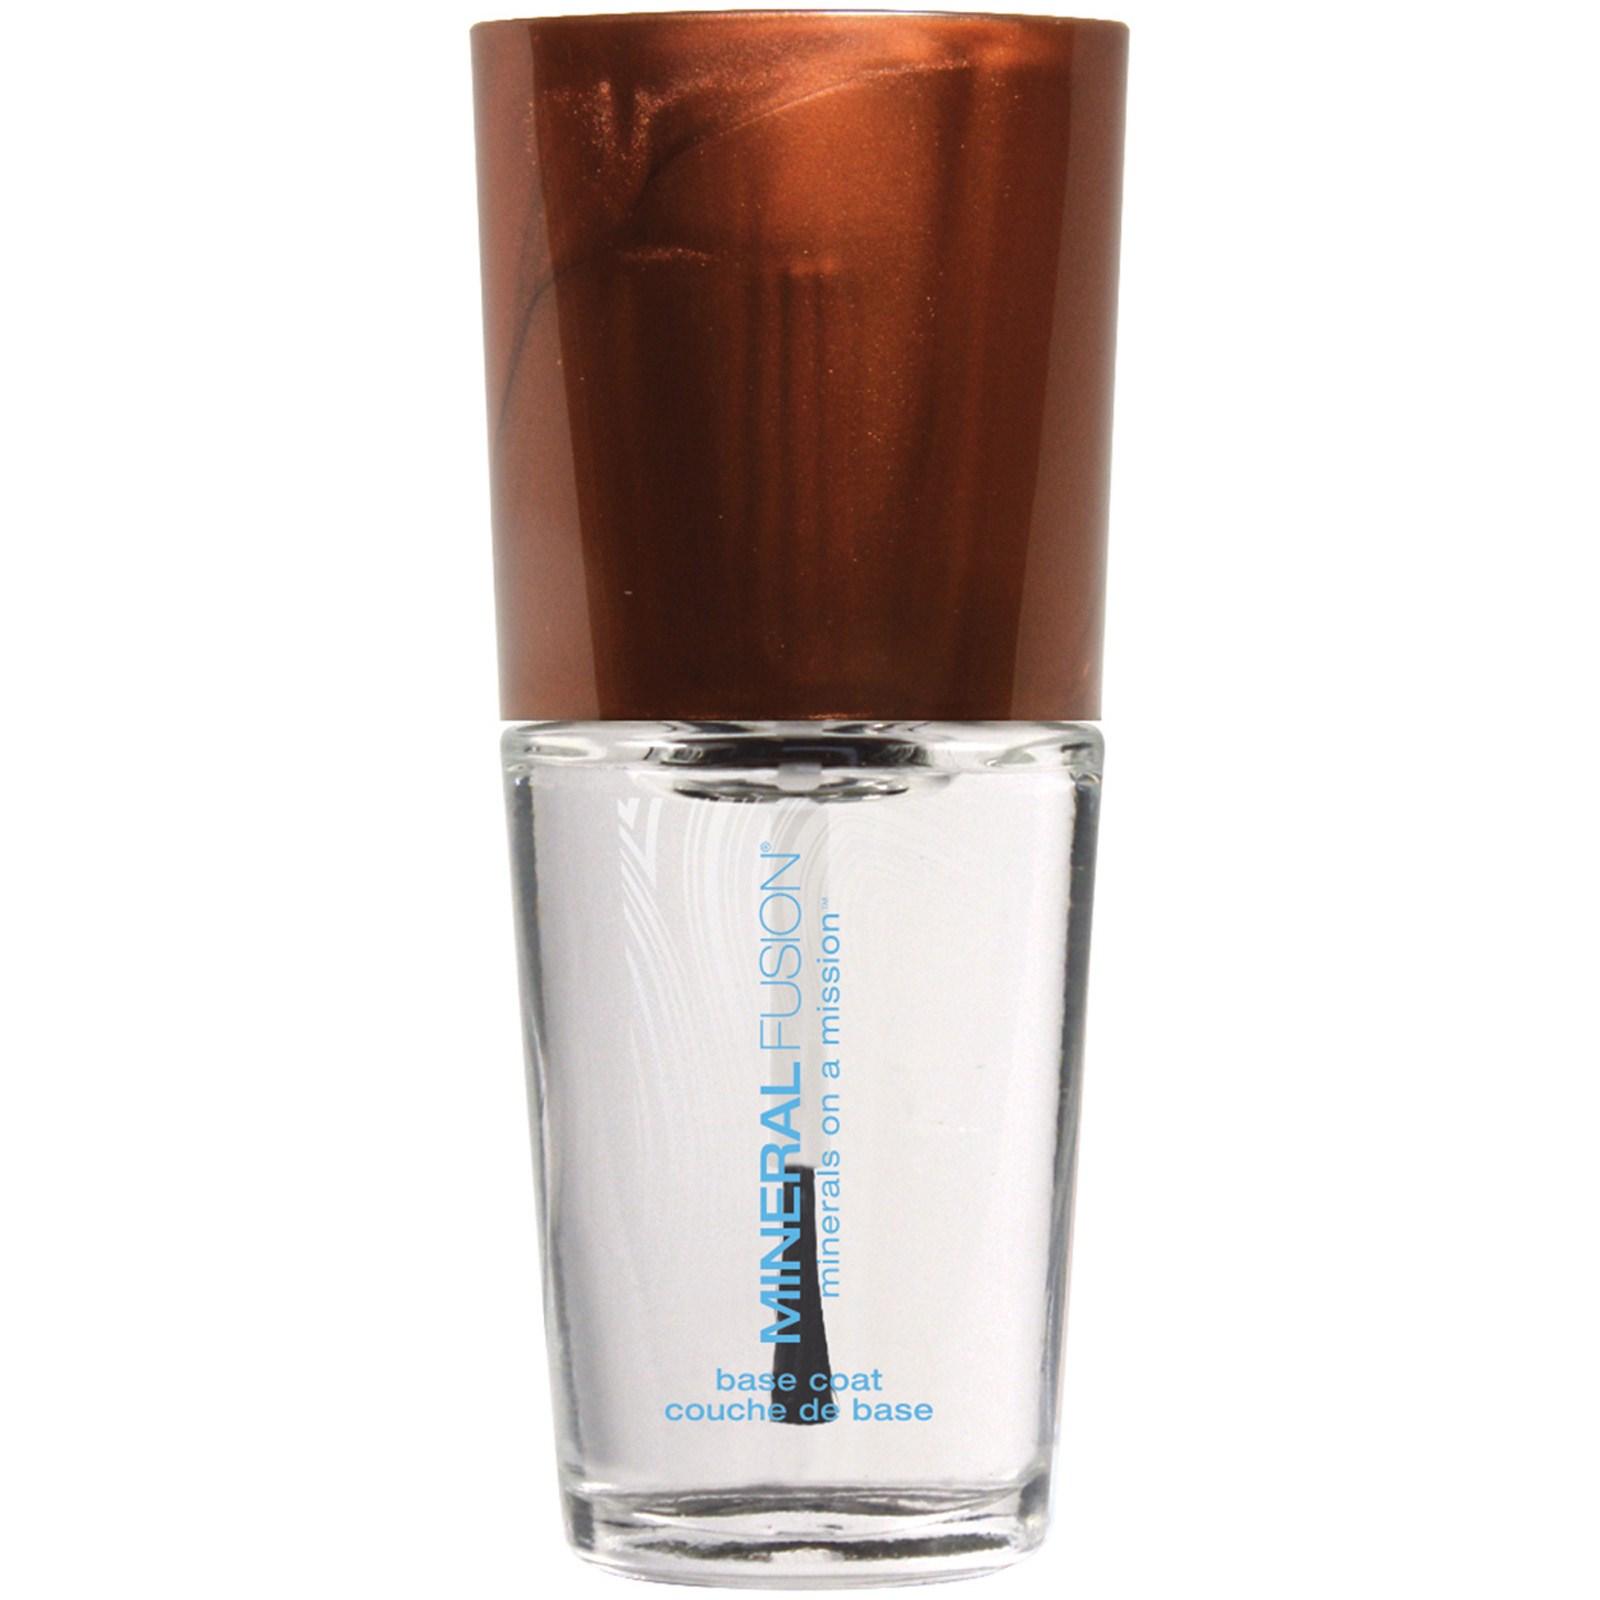 Mineral Fusion, Esmalte, Base Coat, 0.33 fl oz (10 ml) - iHerb.com